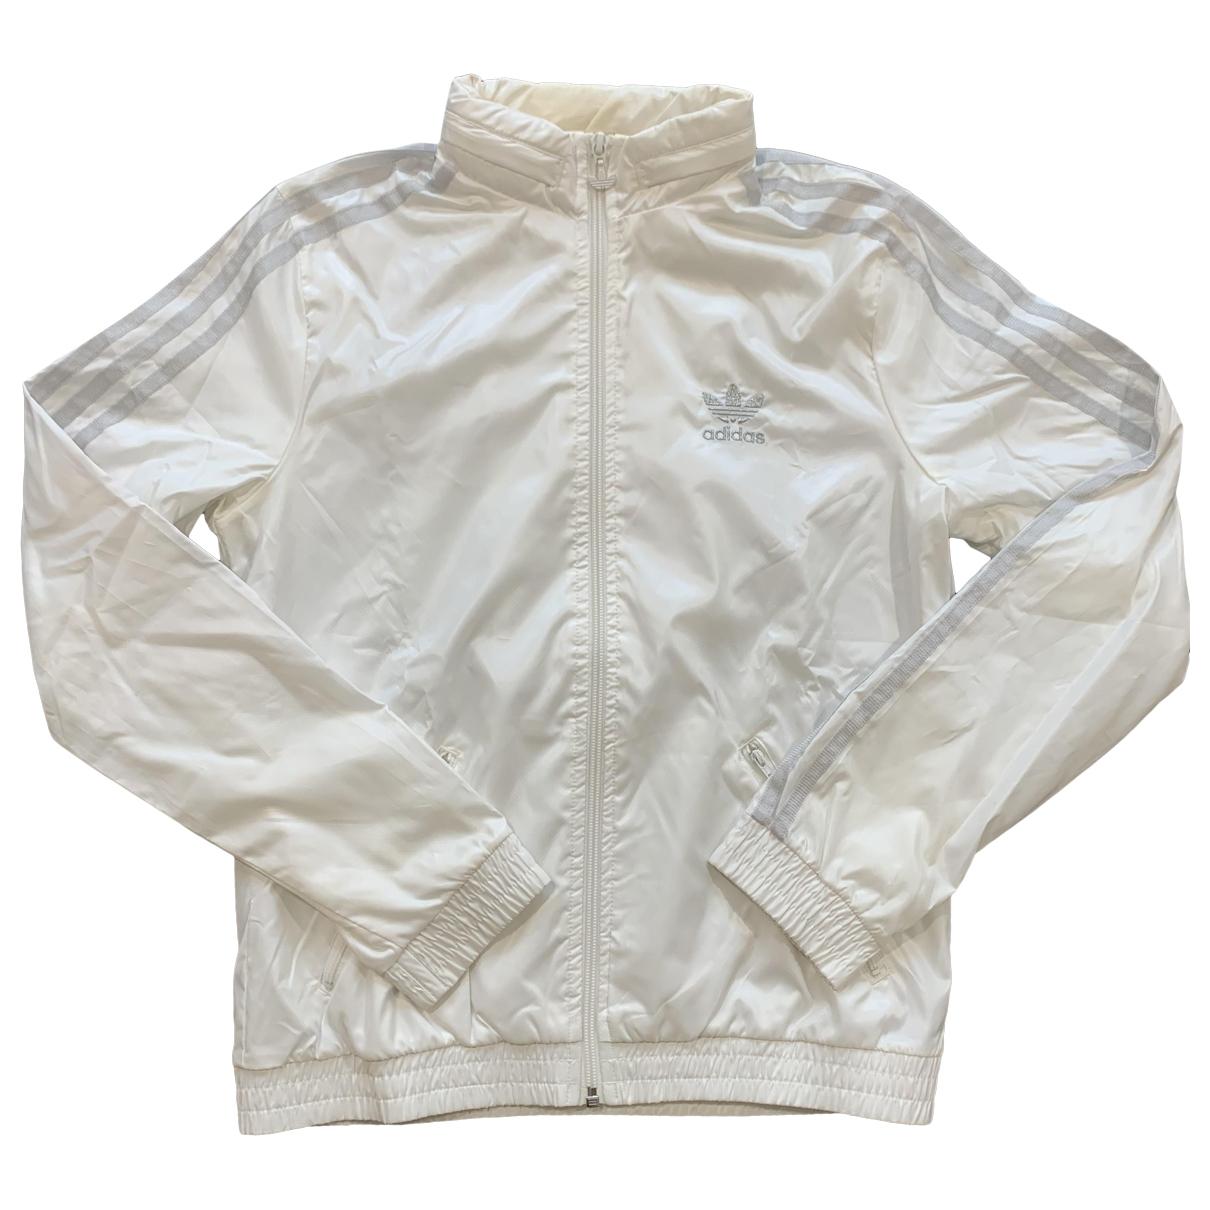 Adidas \N White jacket for Women 36 IT